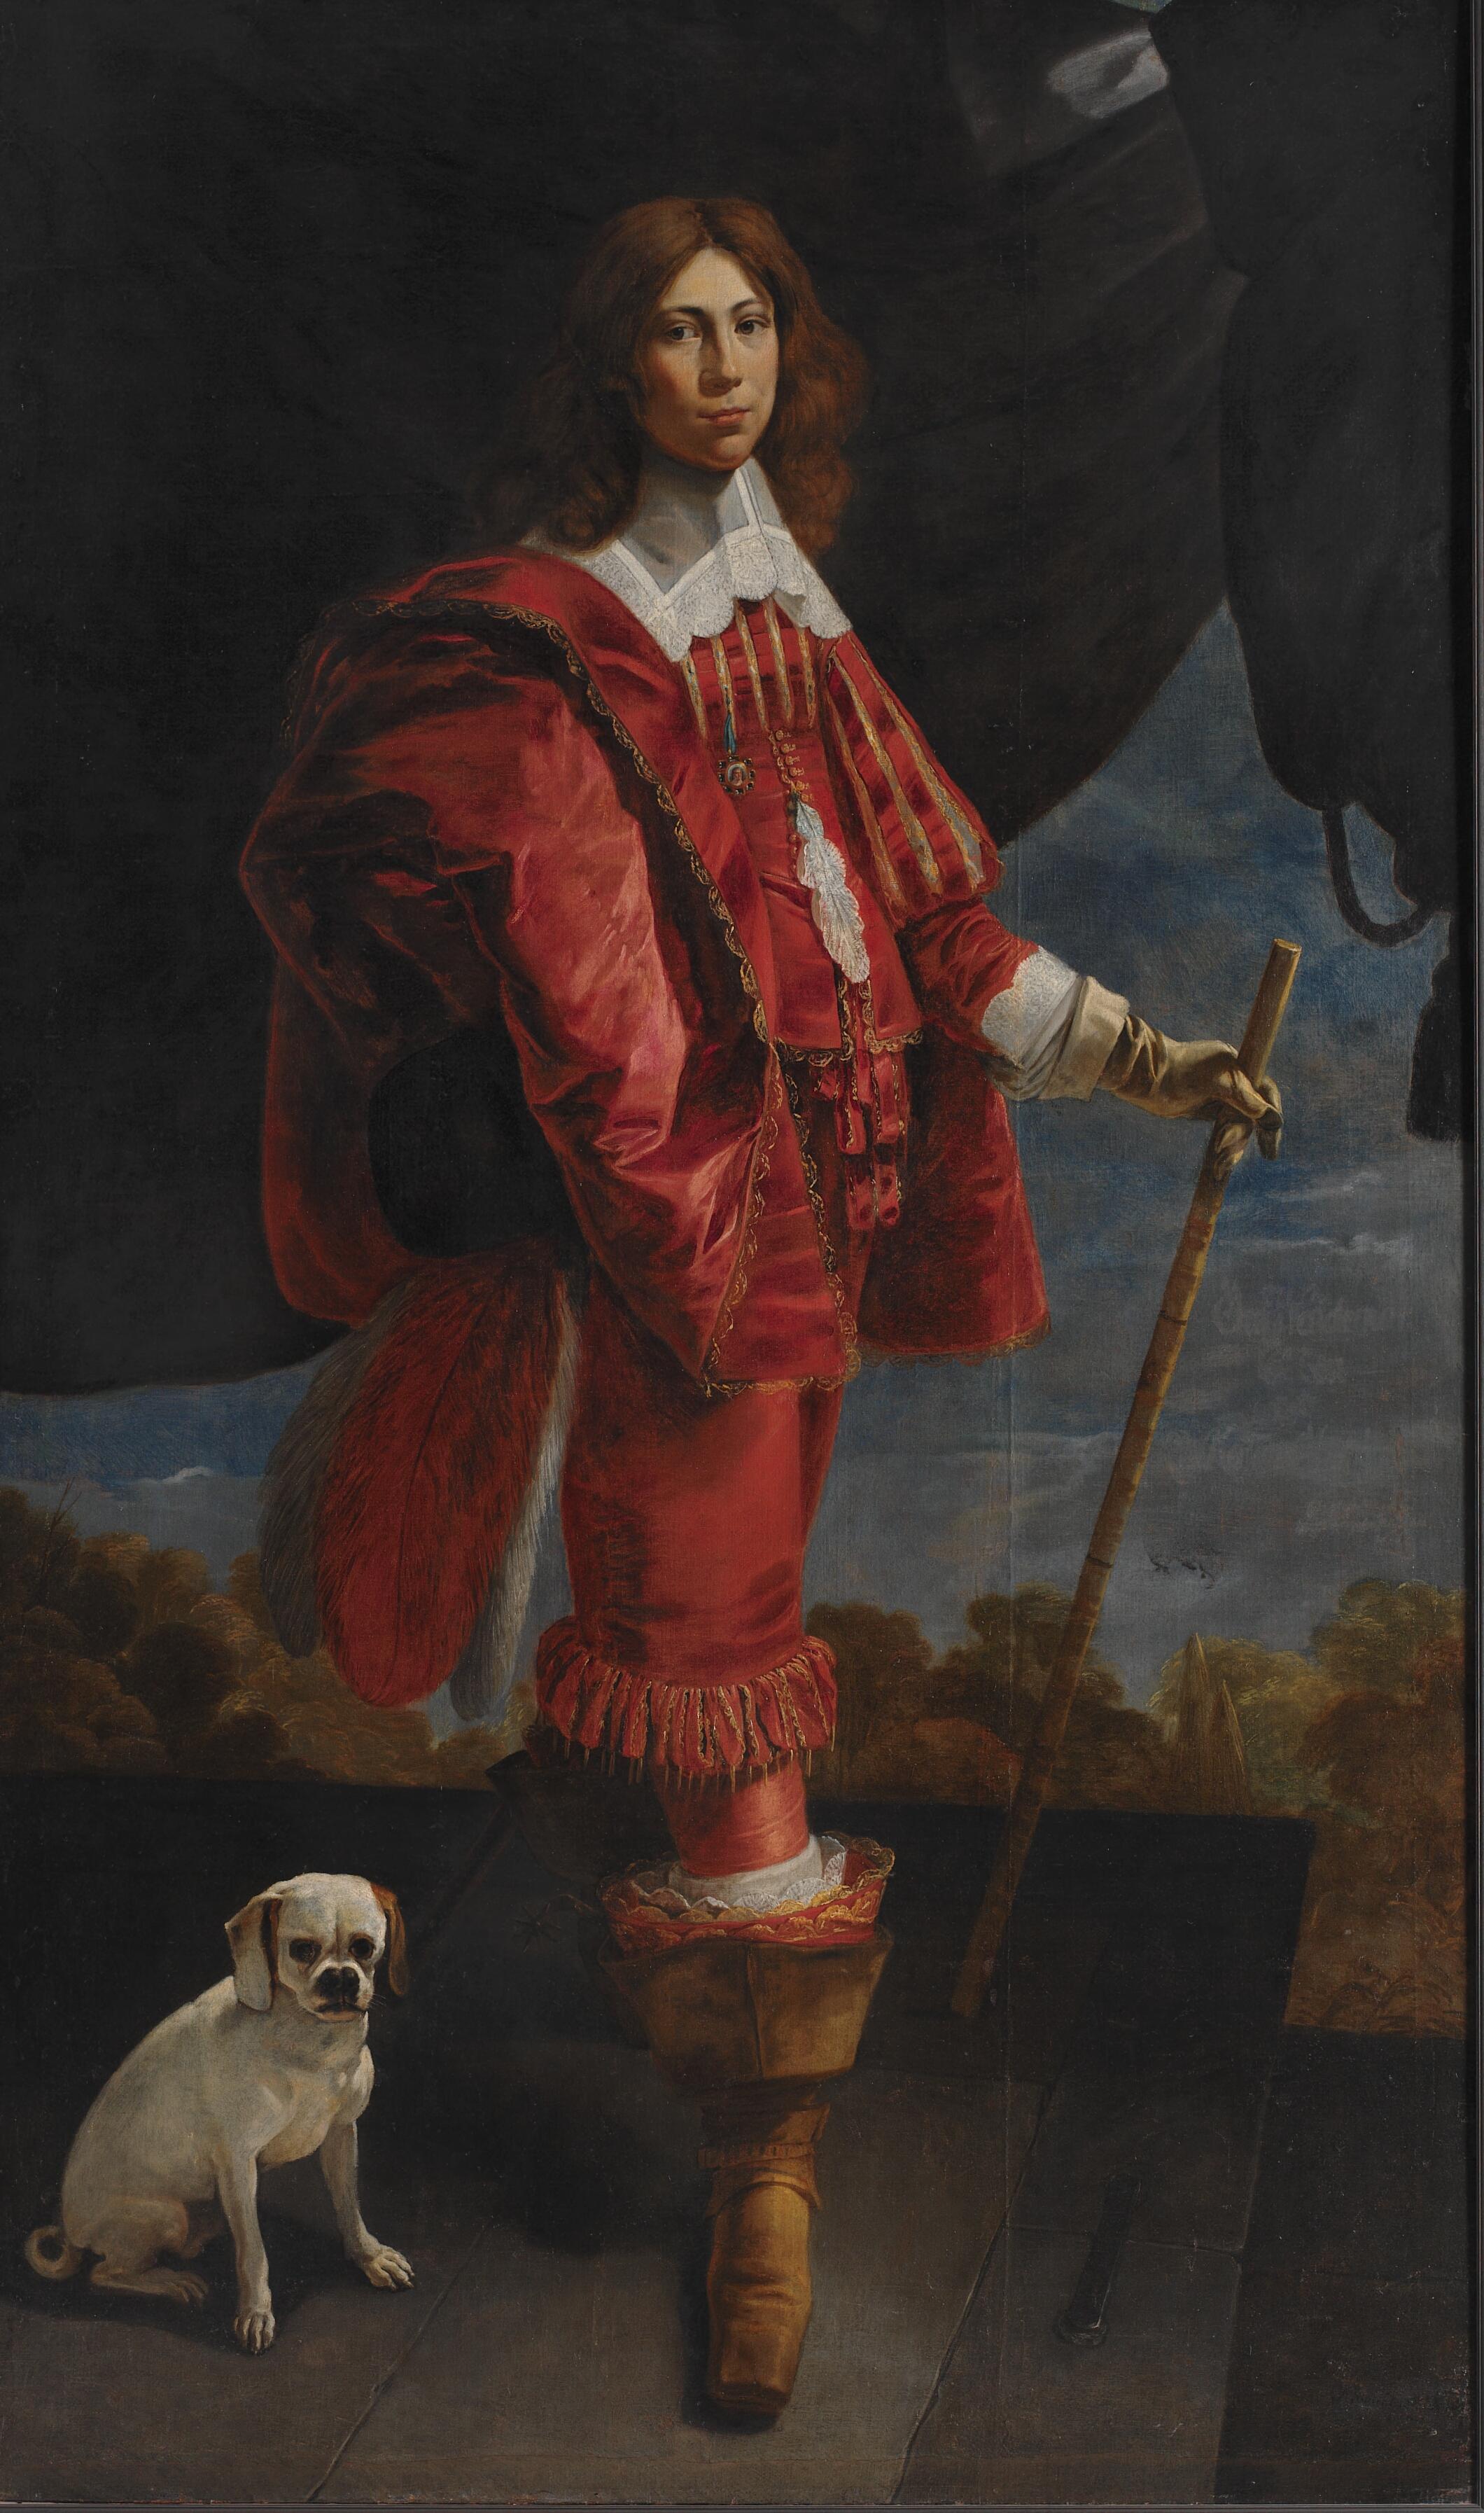 Ulrik Christian Gyldenløve (1630-1658), son of Christian IV and Vibeke Kruse